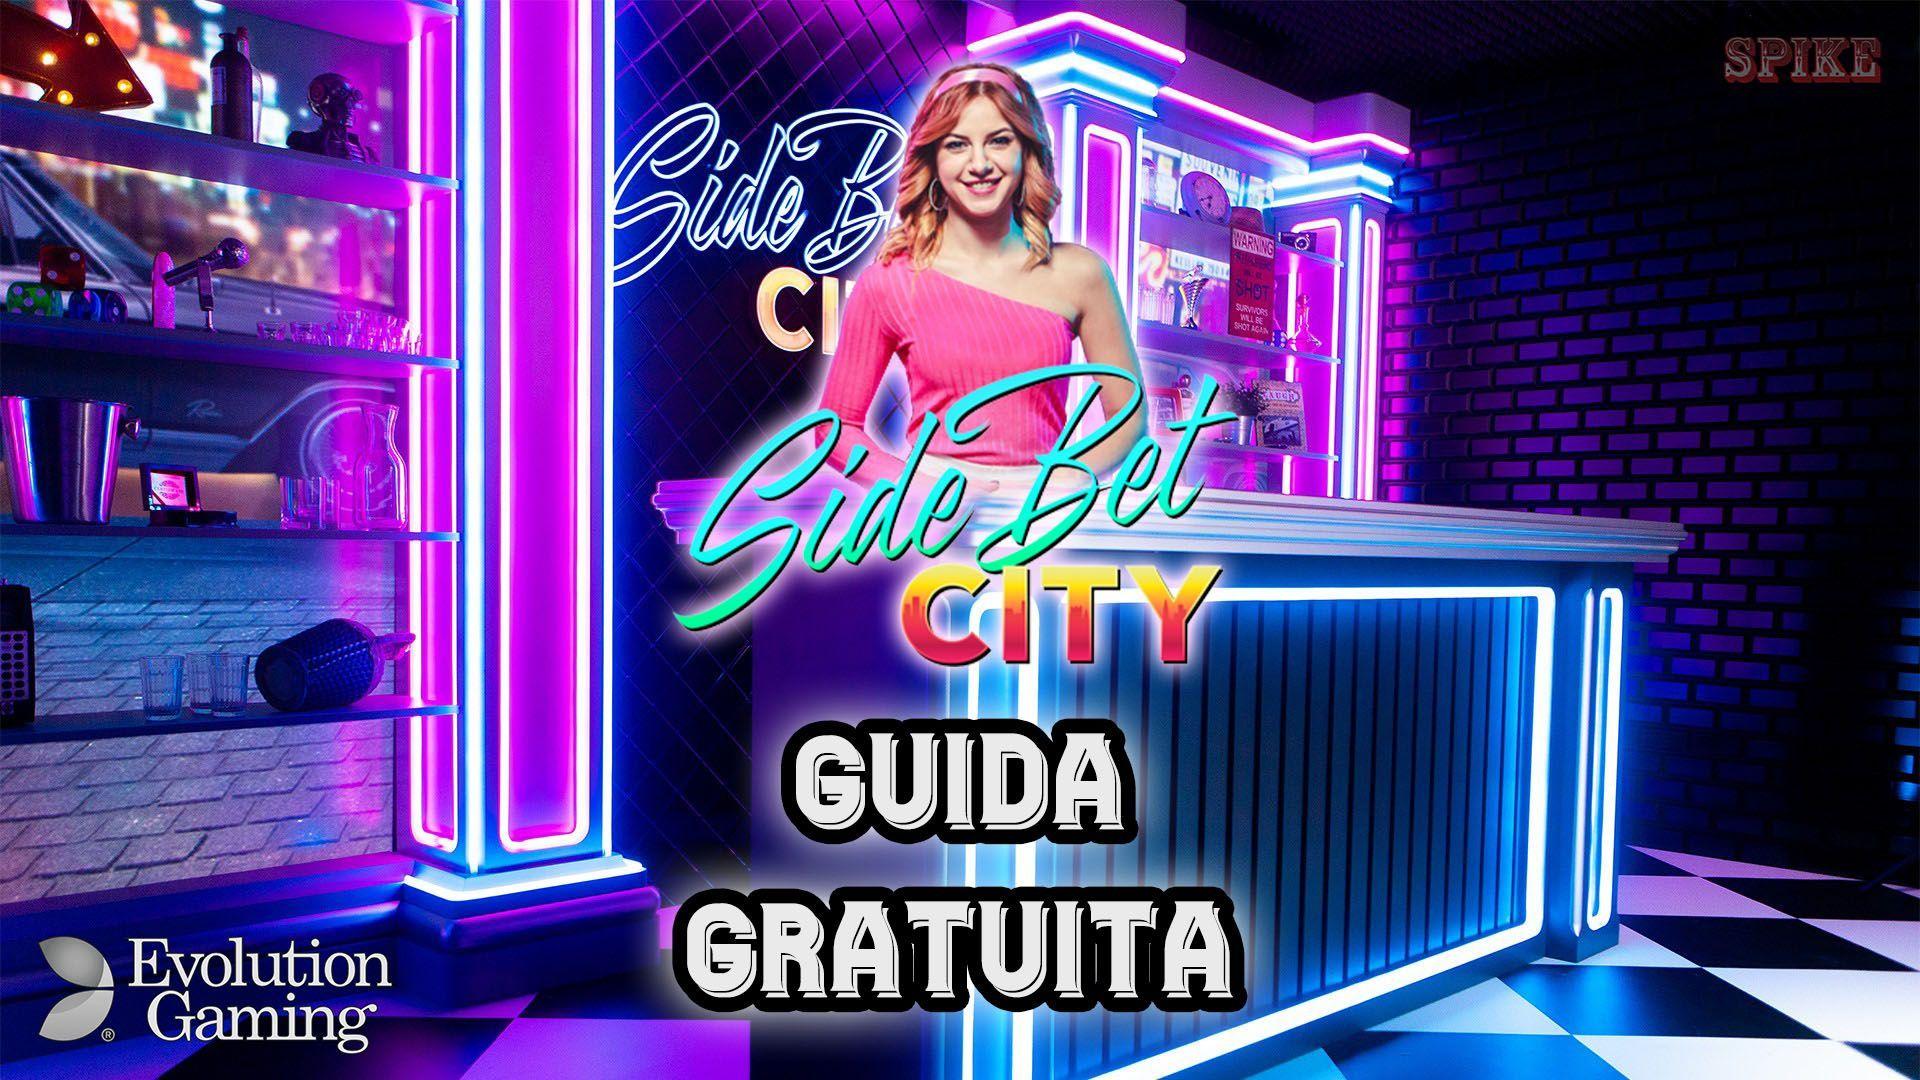 Side Bet City Evolution Gaming Guida Gratis